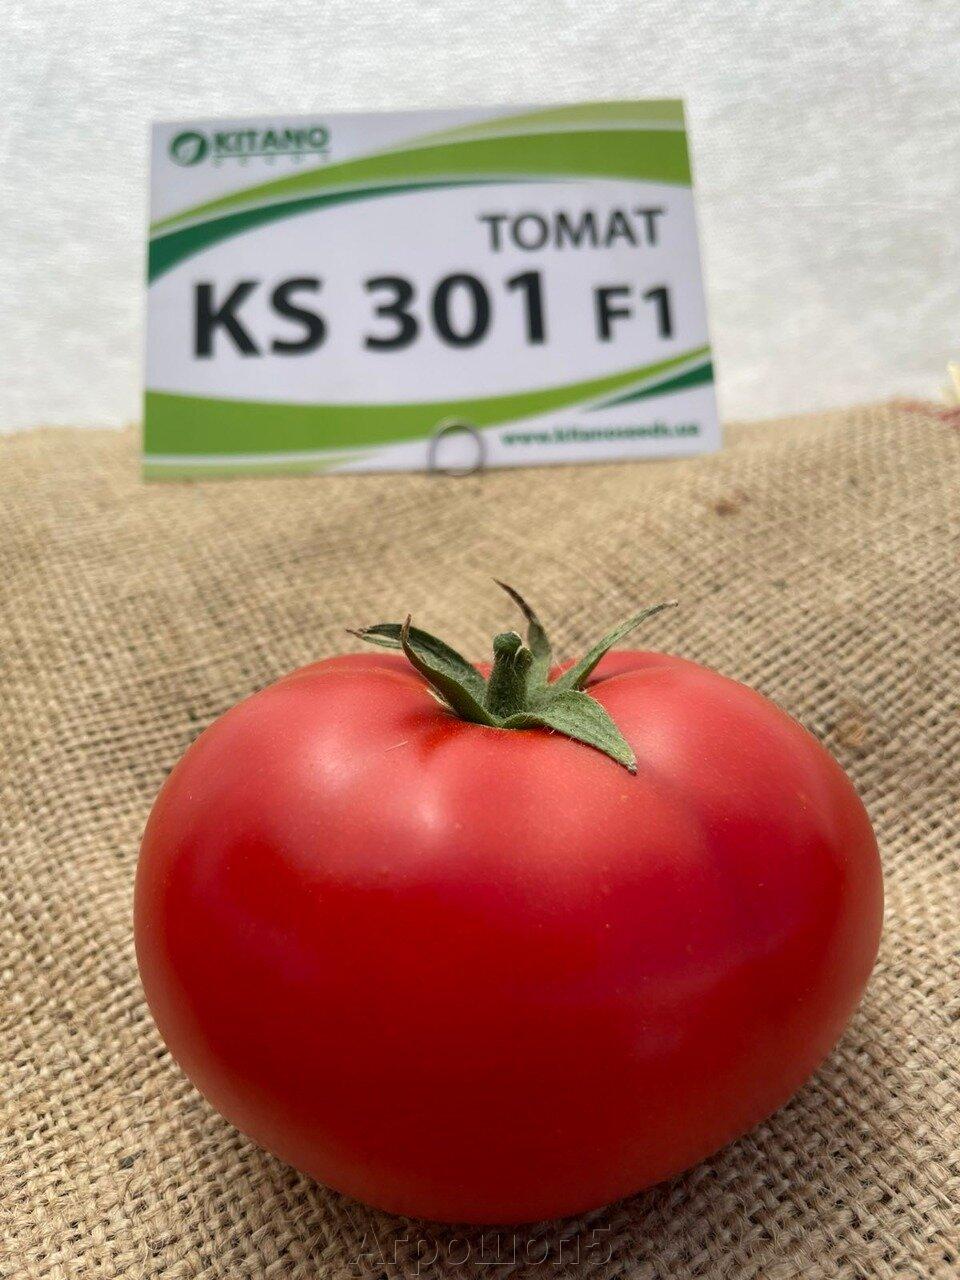 День поля по томатам от компании Kitano - фото pic_6d401eddf76f8b01d888925187ef5643_1920x9000_1.jpg